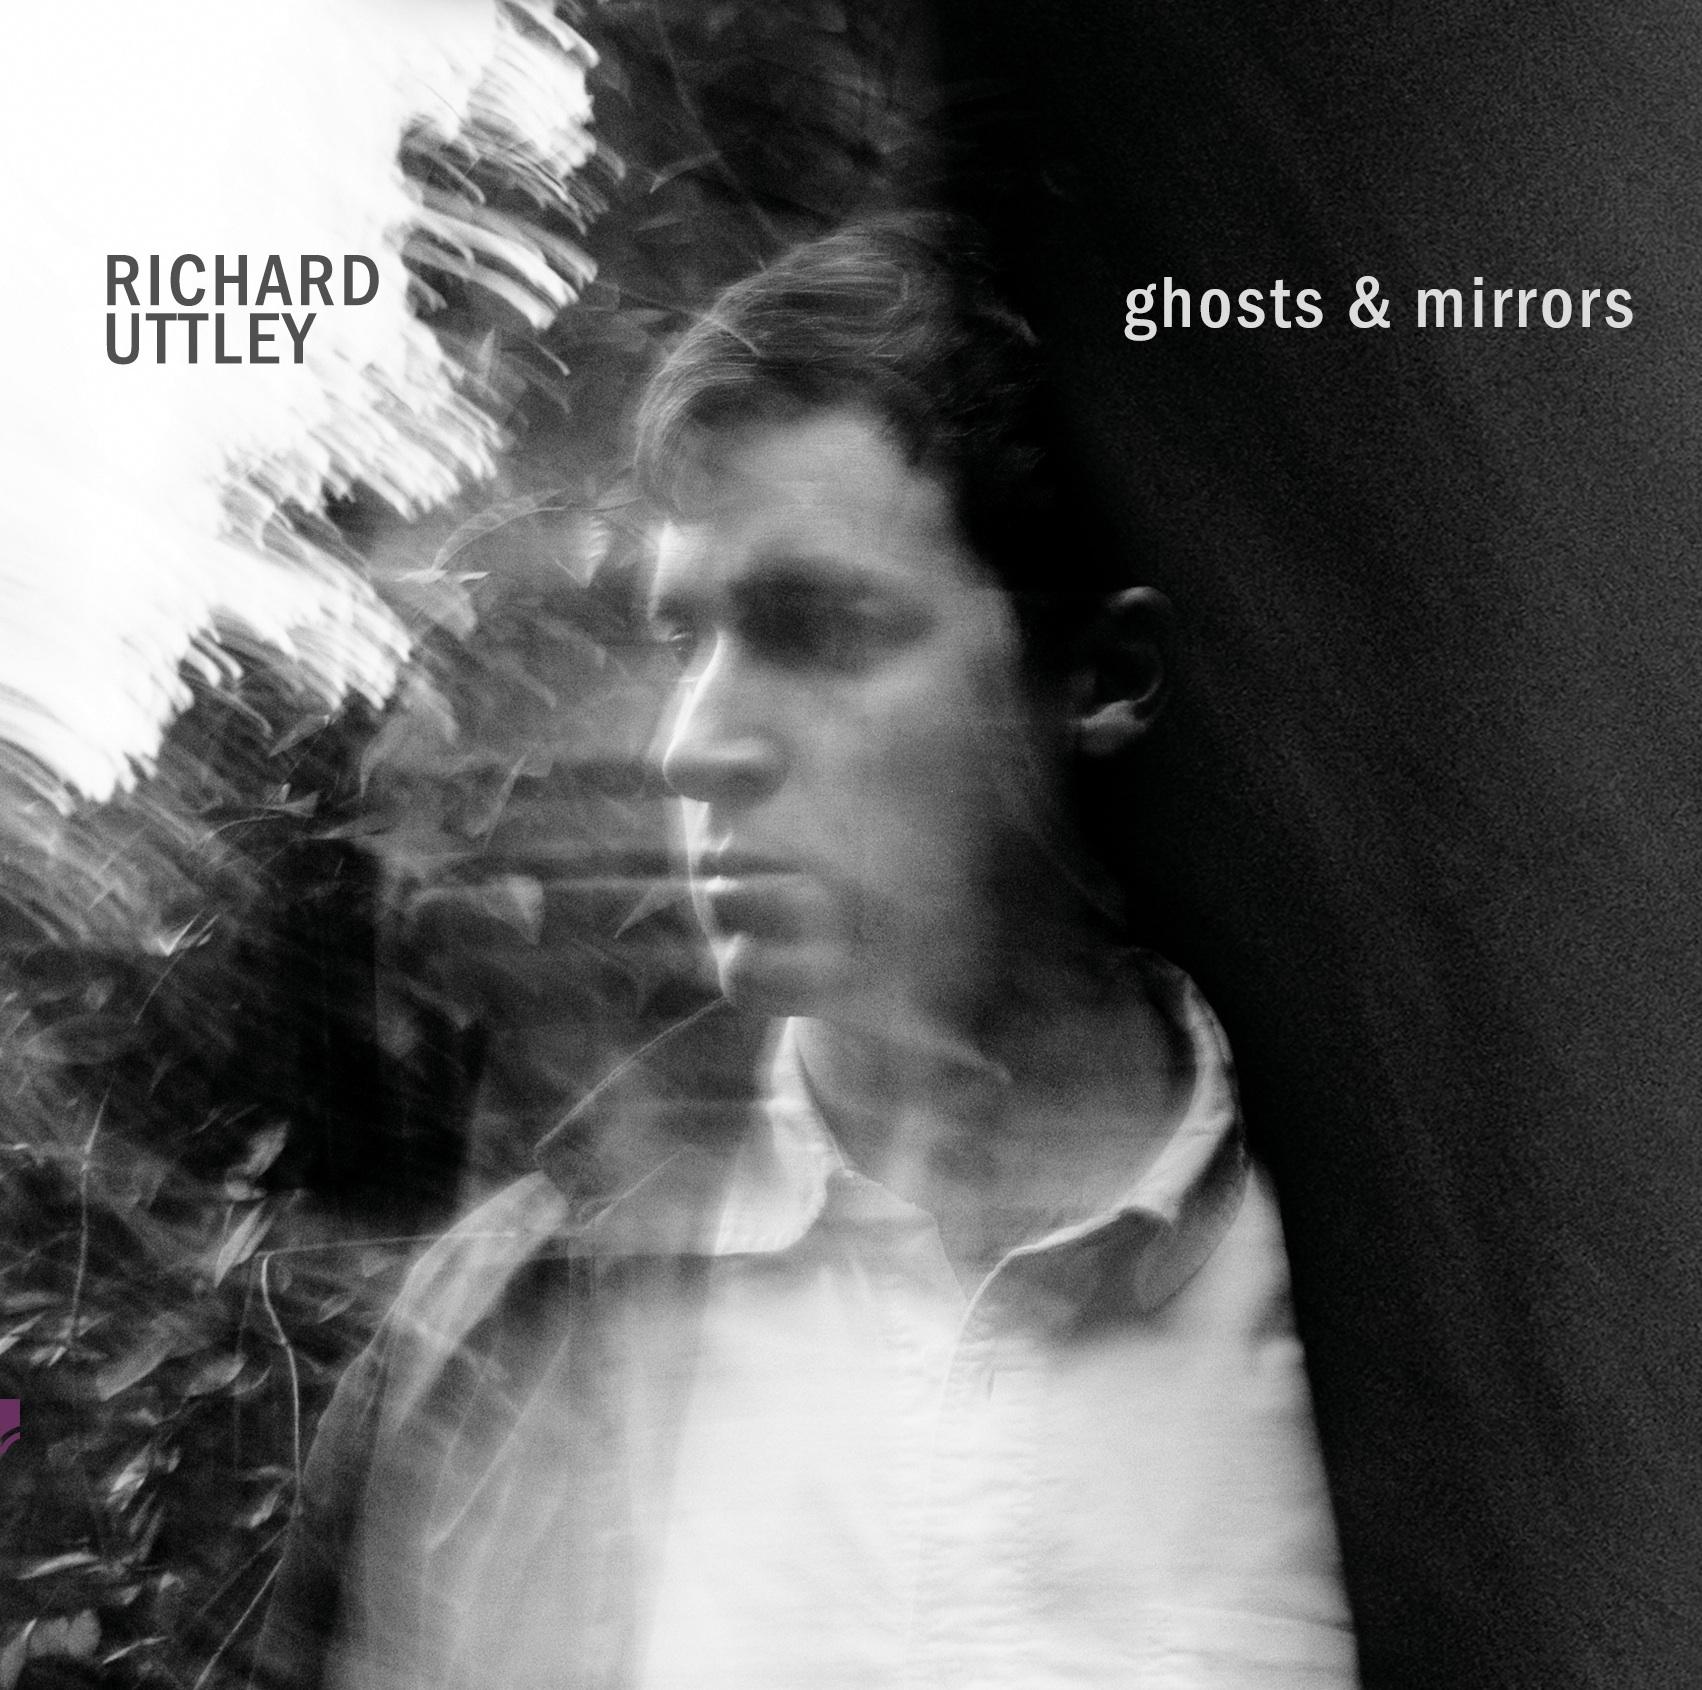 Ghosts & Mirrors cover credit Nat Urazmetova